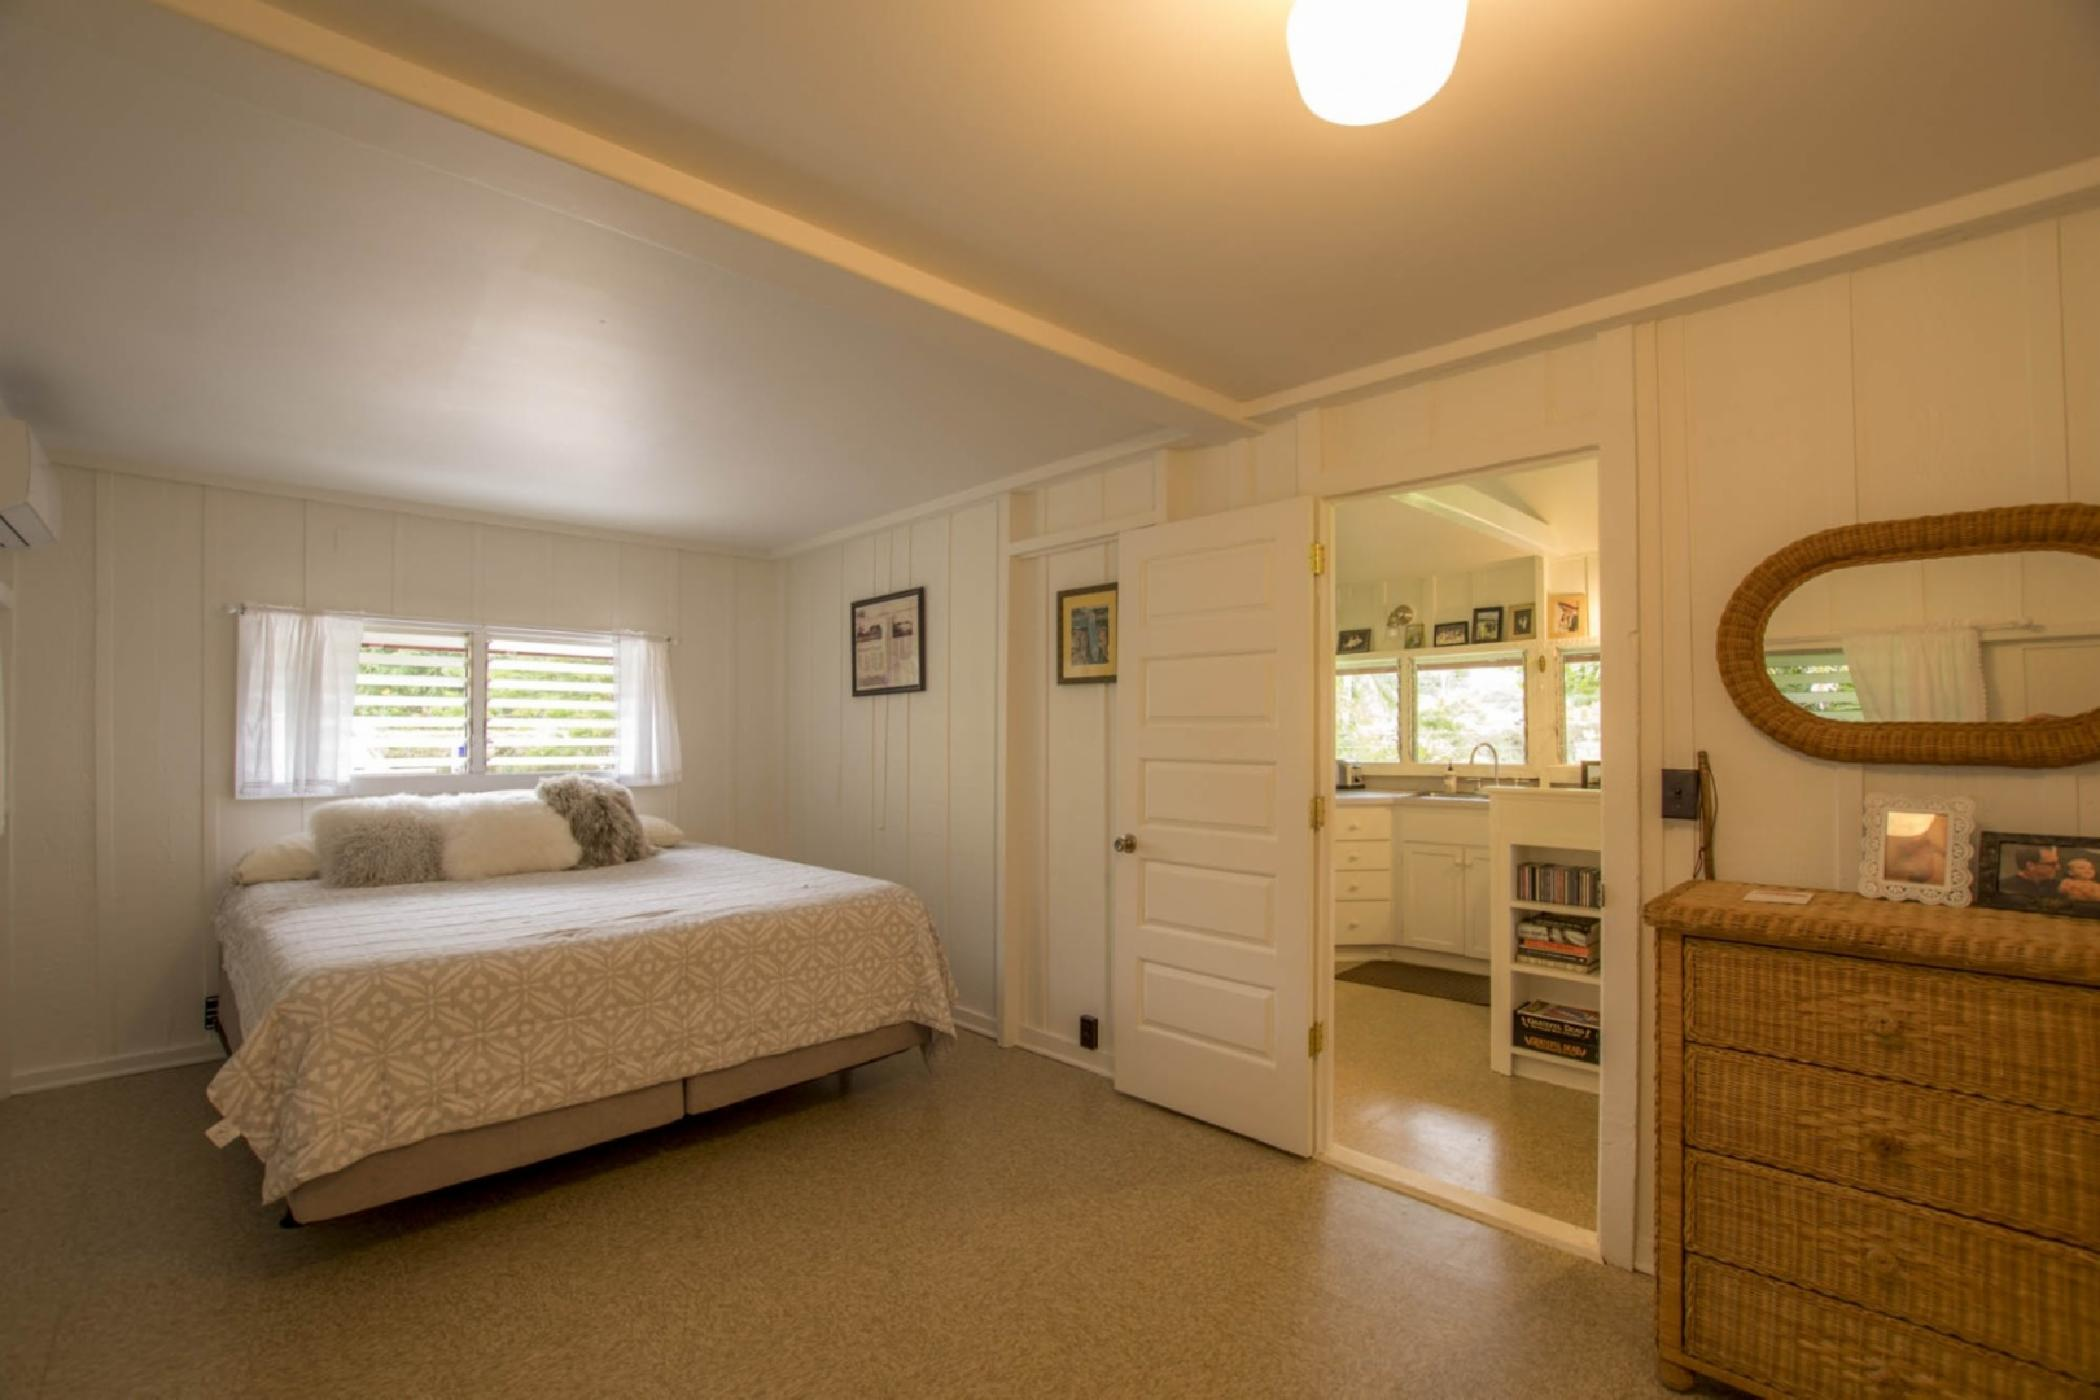 guest-house-bedroom-2.jpeg